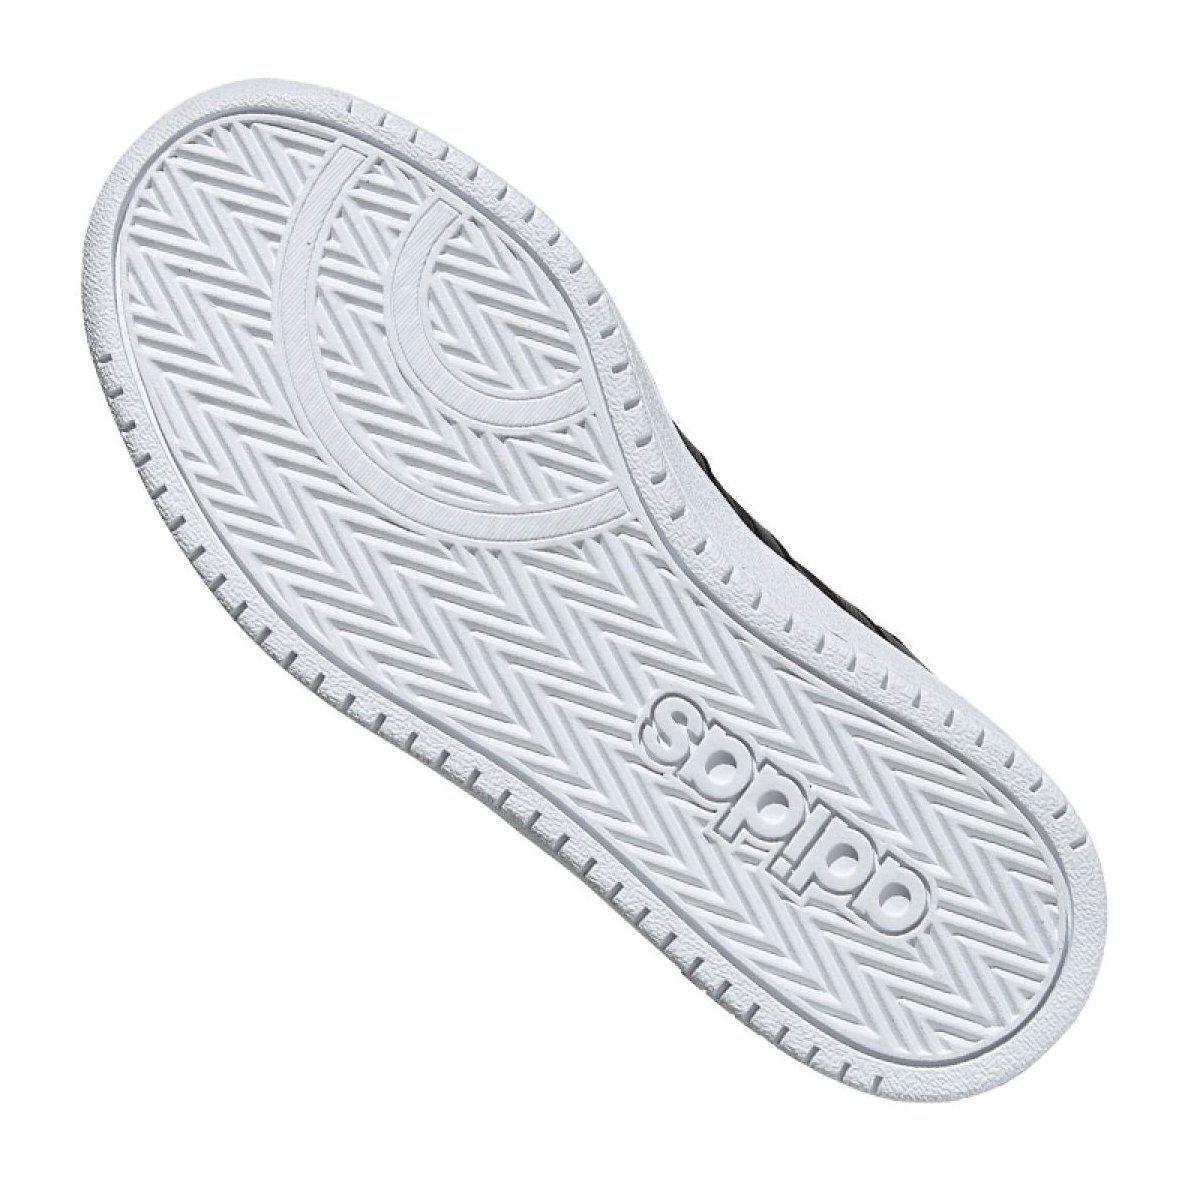 Buty Adidas Hoops Mid 2 0 Jr Ee8547 Czarne Junior Shoes Black Shoes Sports Shoes Adidas